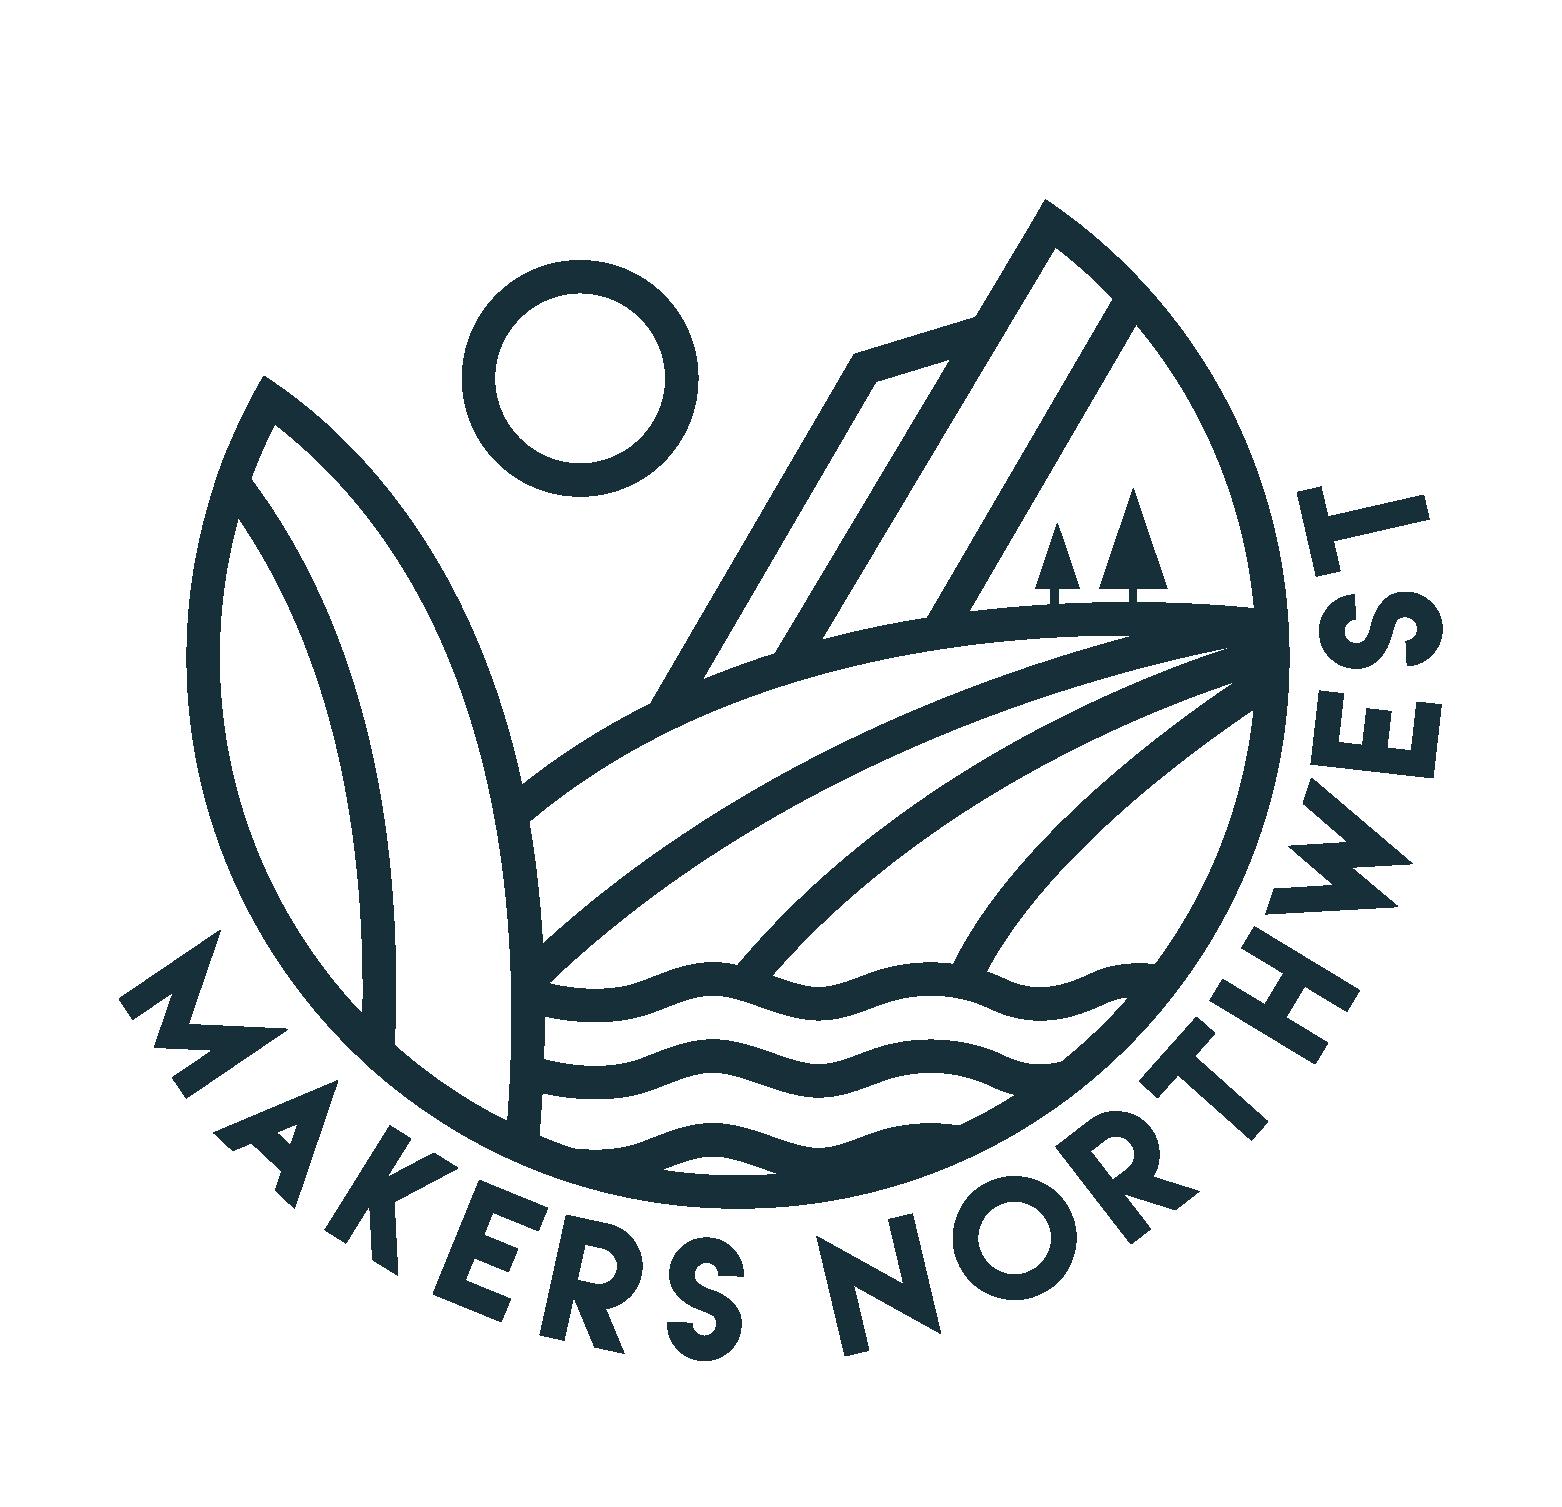 Makers Northwest